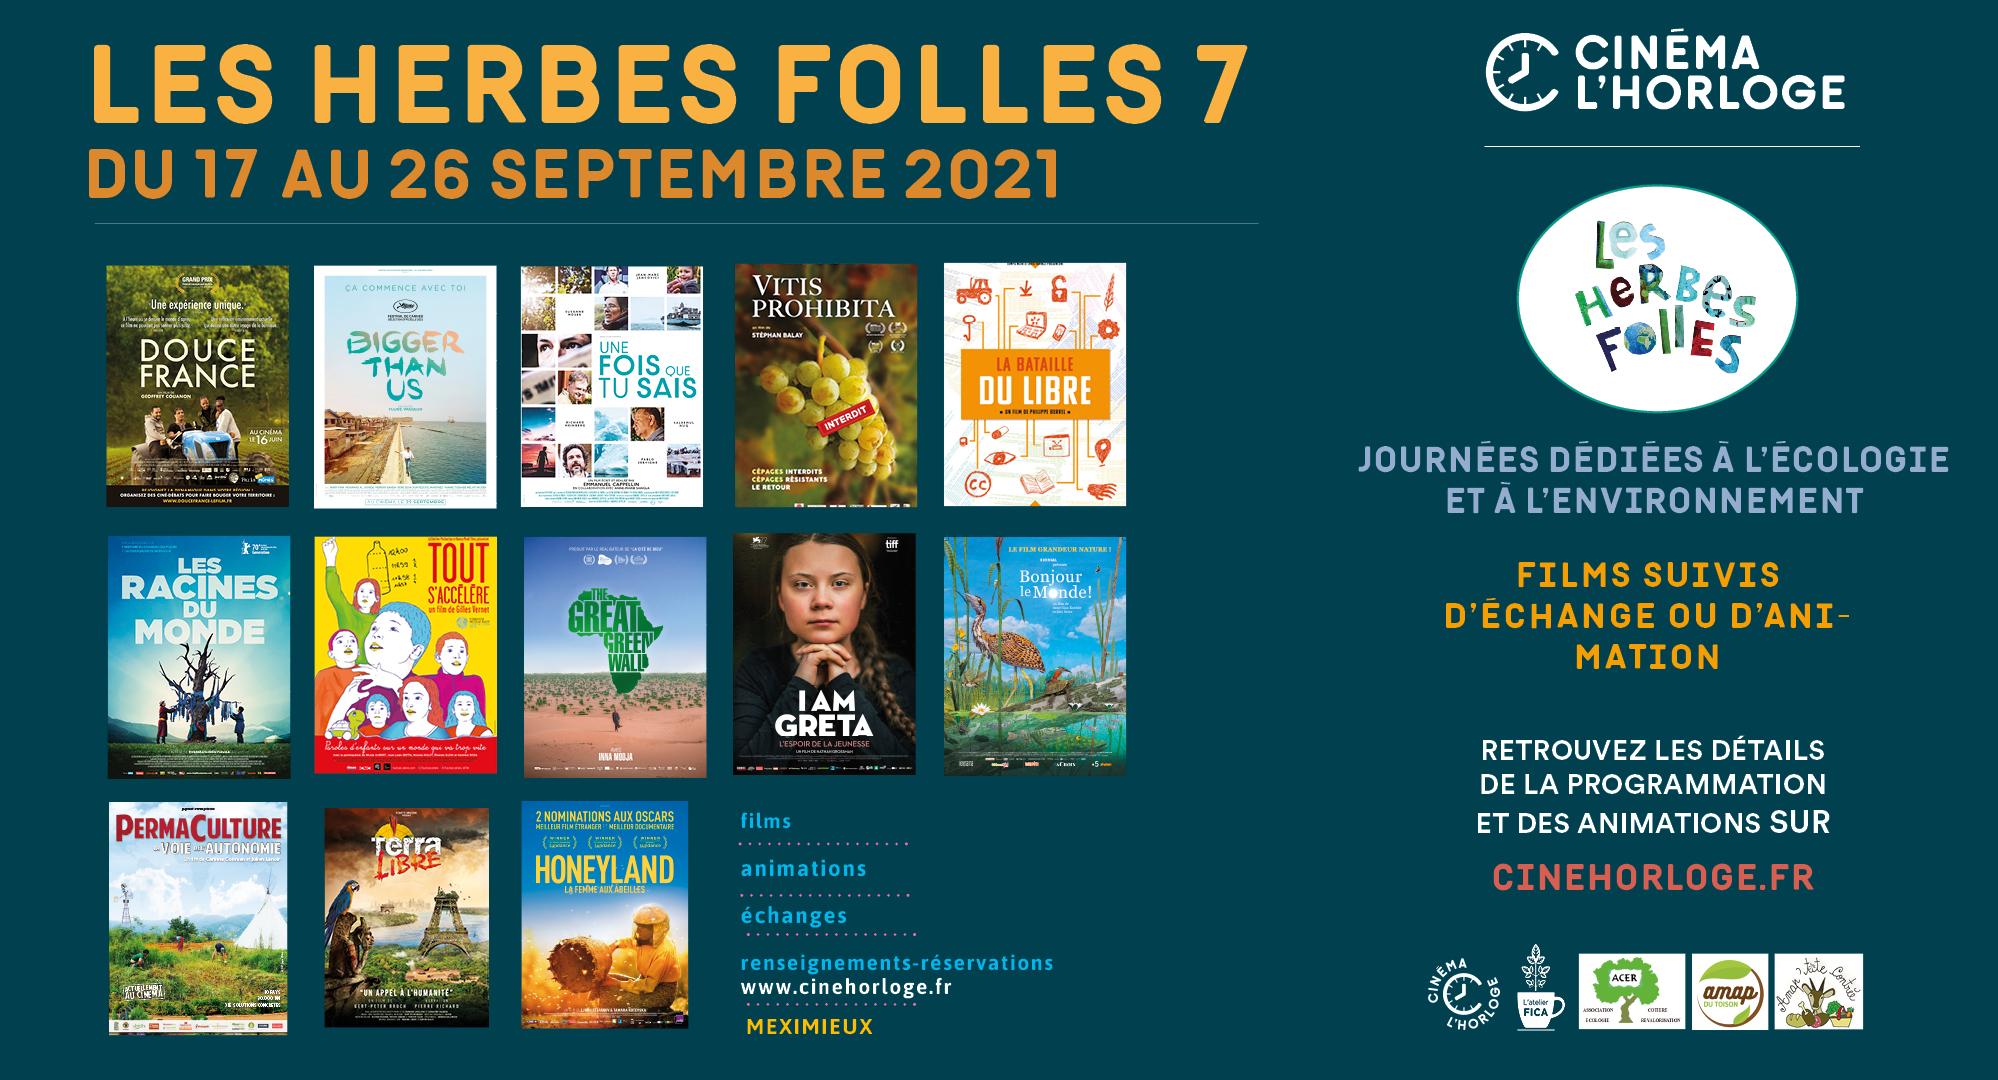 Festival Les Herbes Folles 7